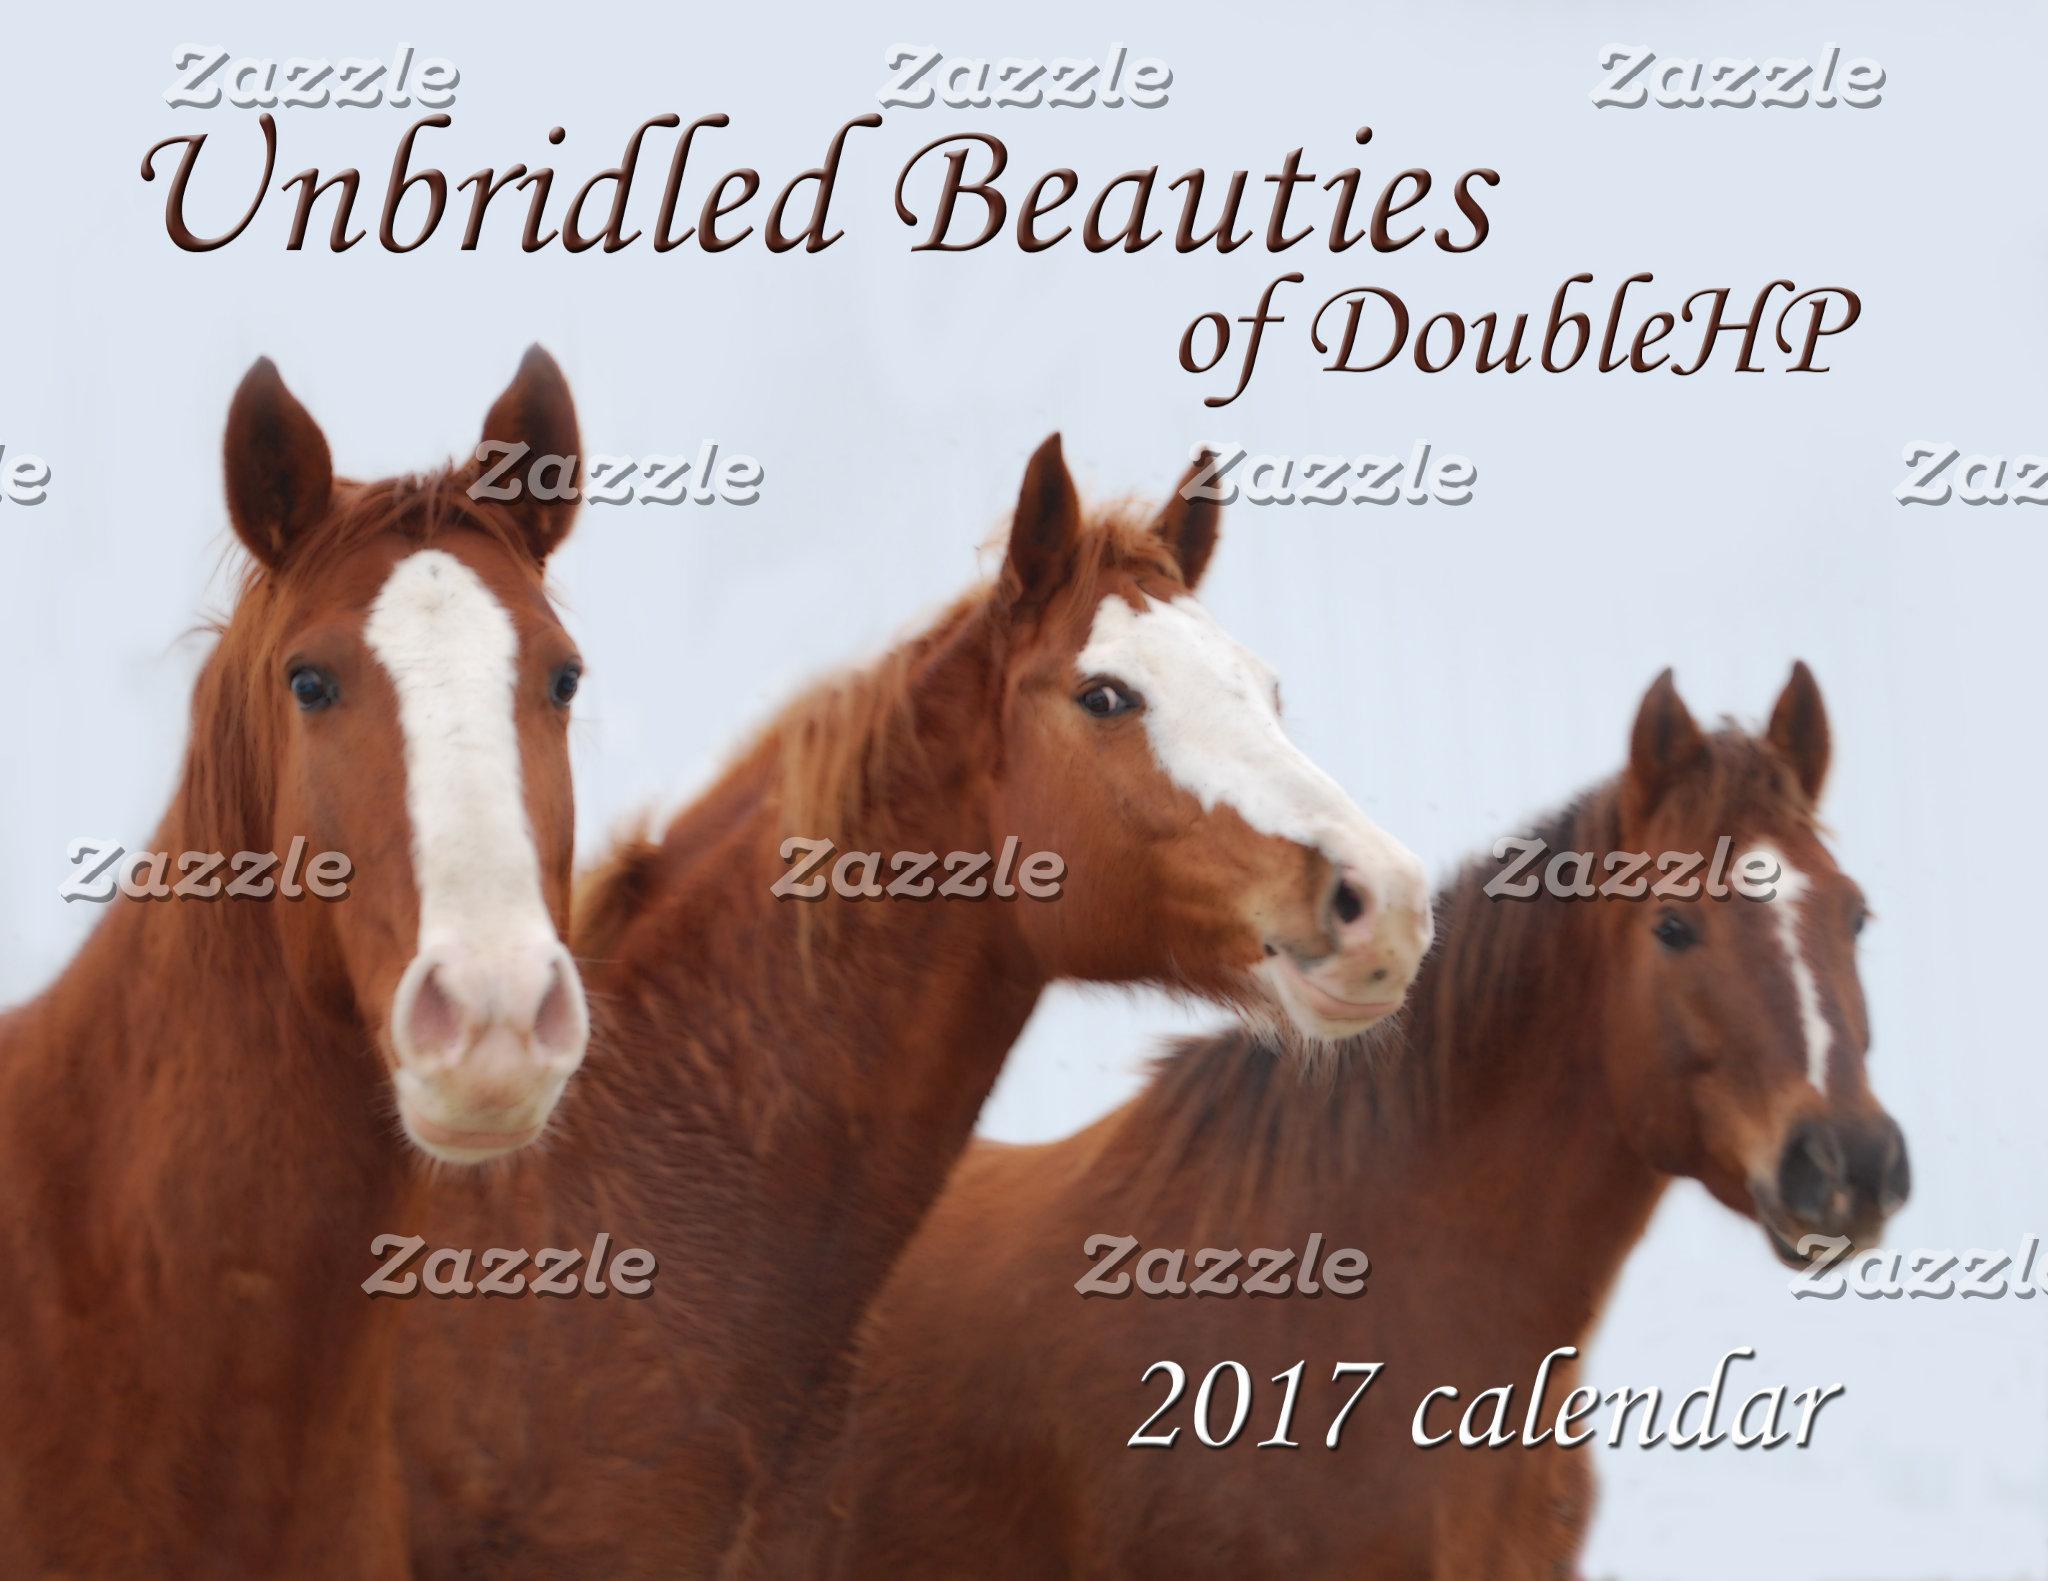 Previous Years Calendars